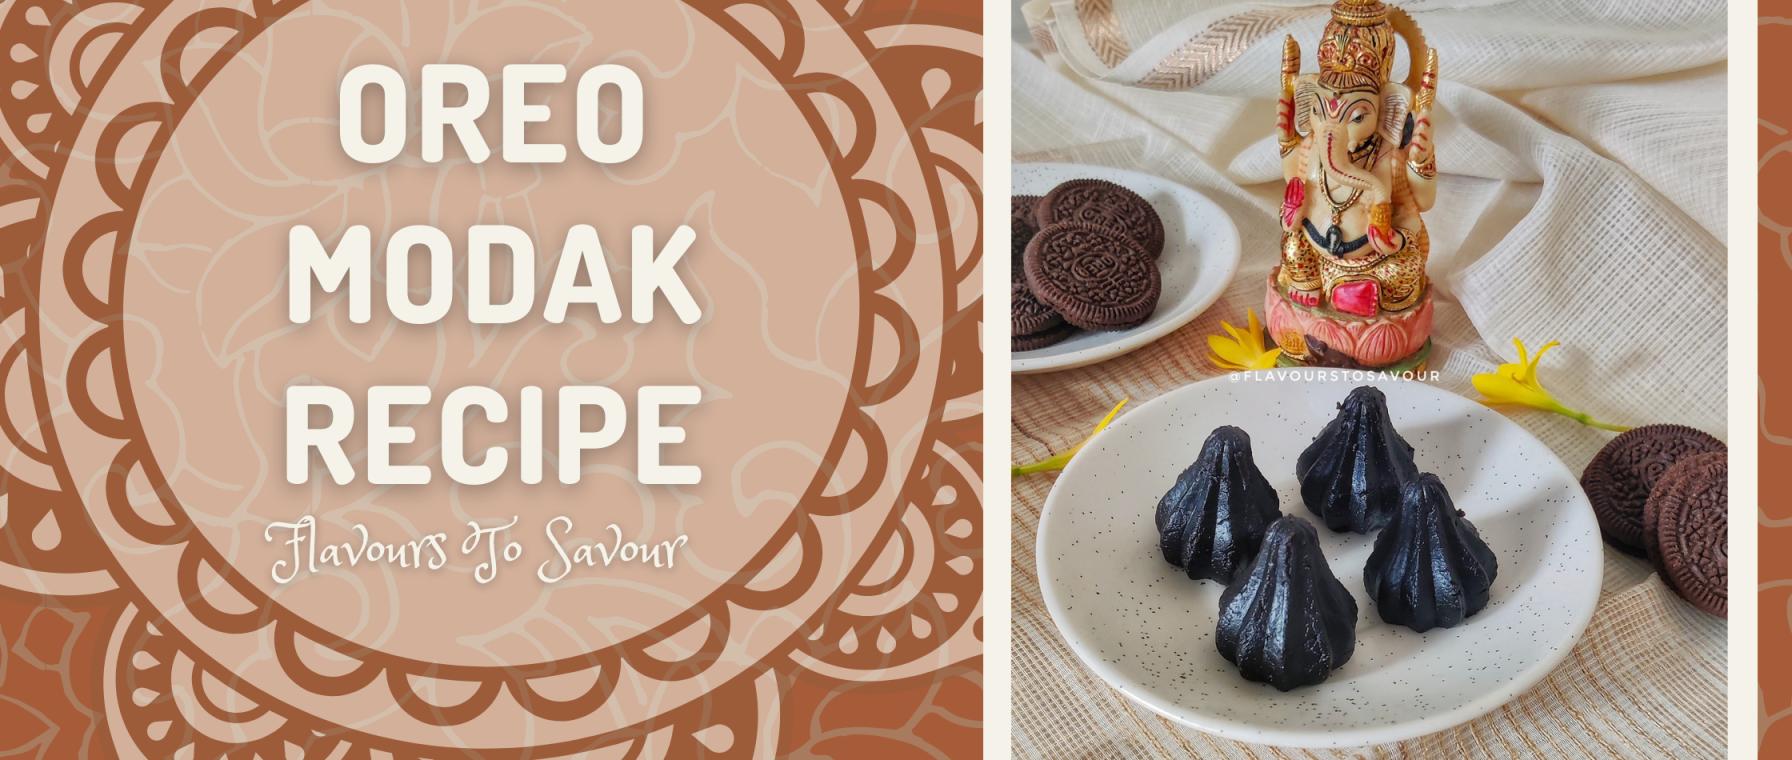 Oreo Biscuit Modak Recipe at home